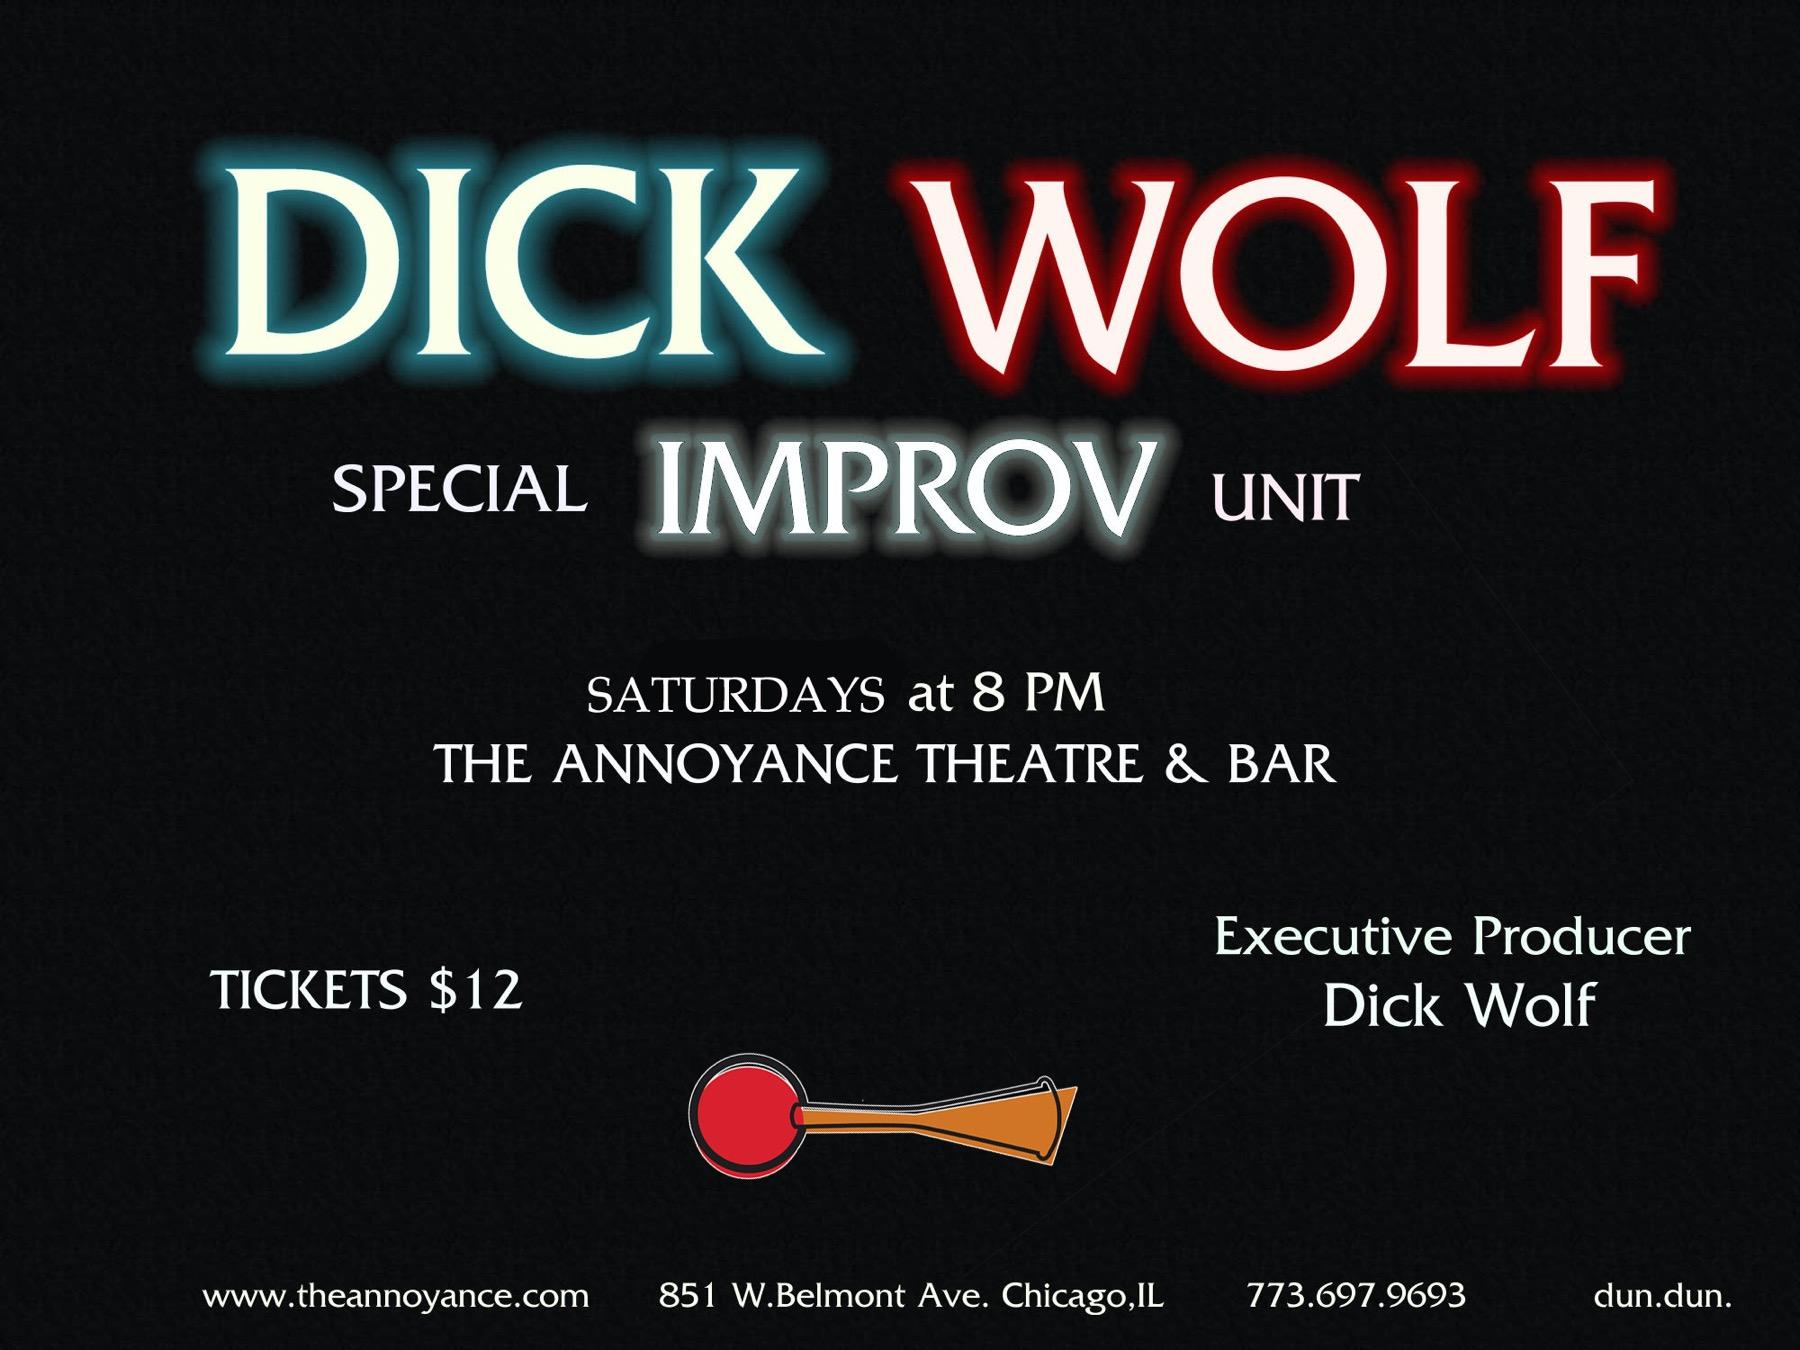 Dick Wolf Improv